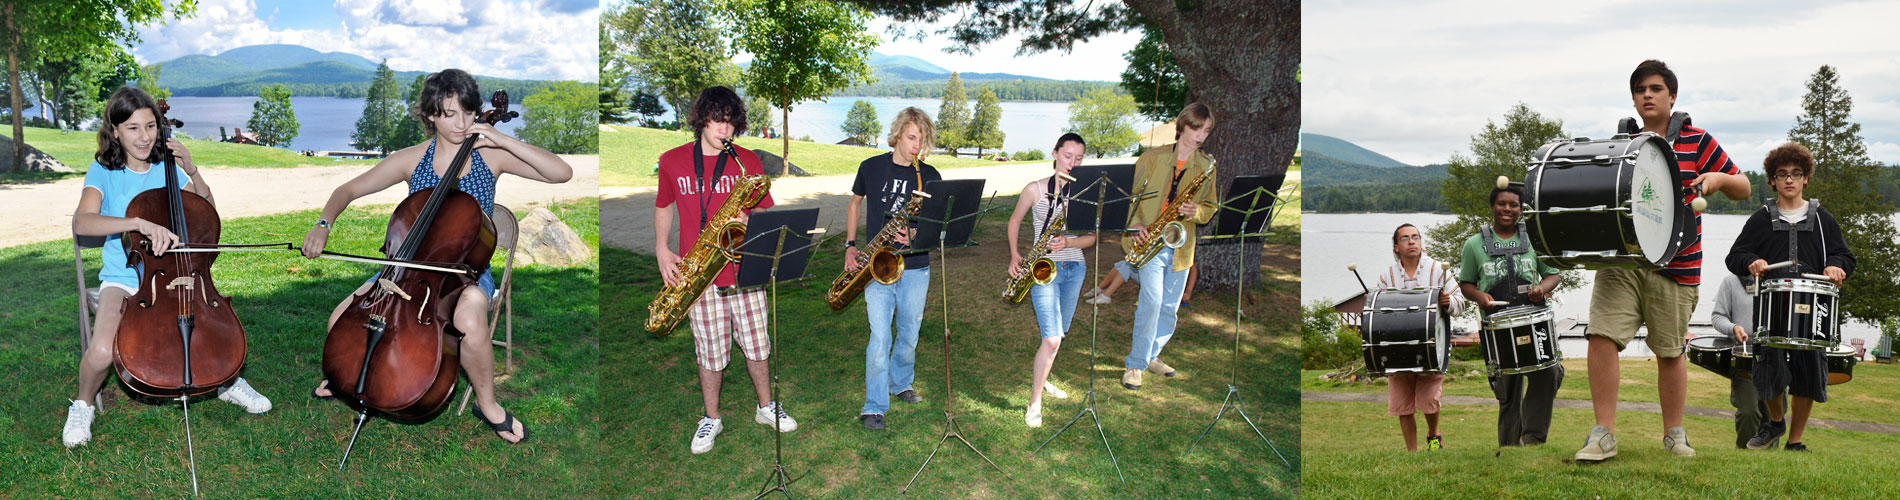 music-camp-001